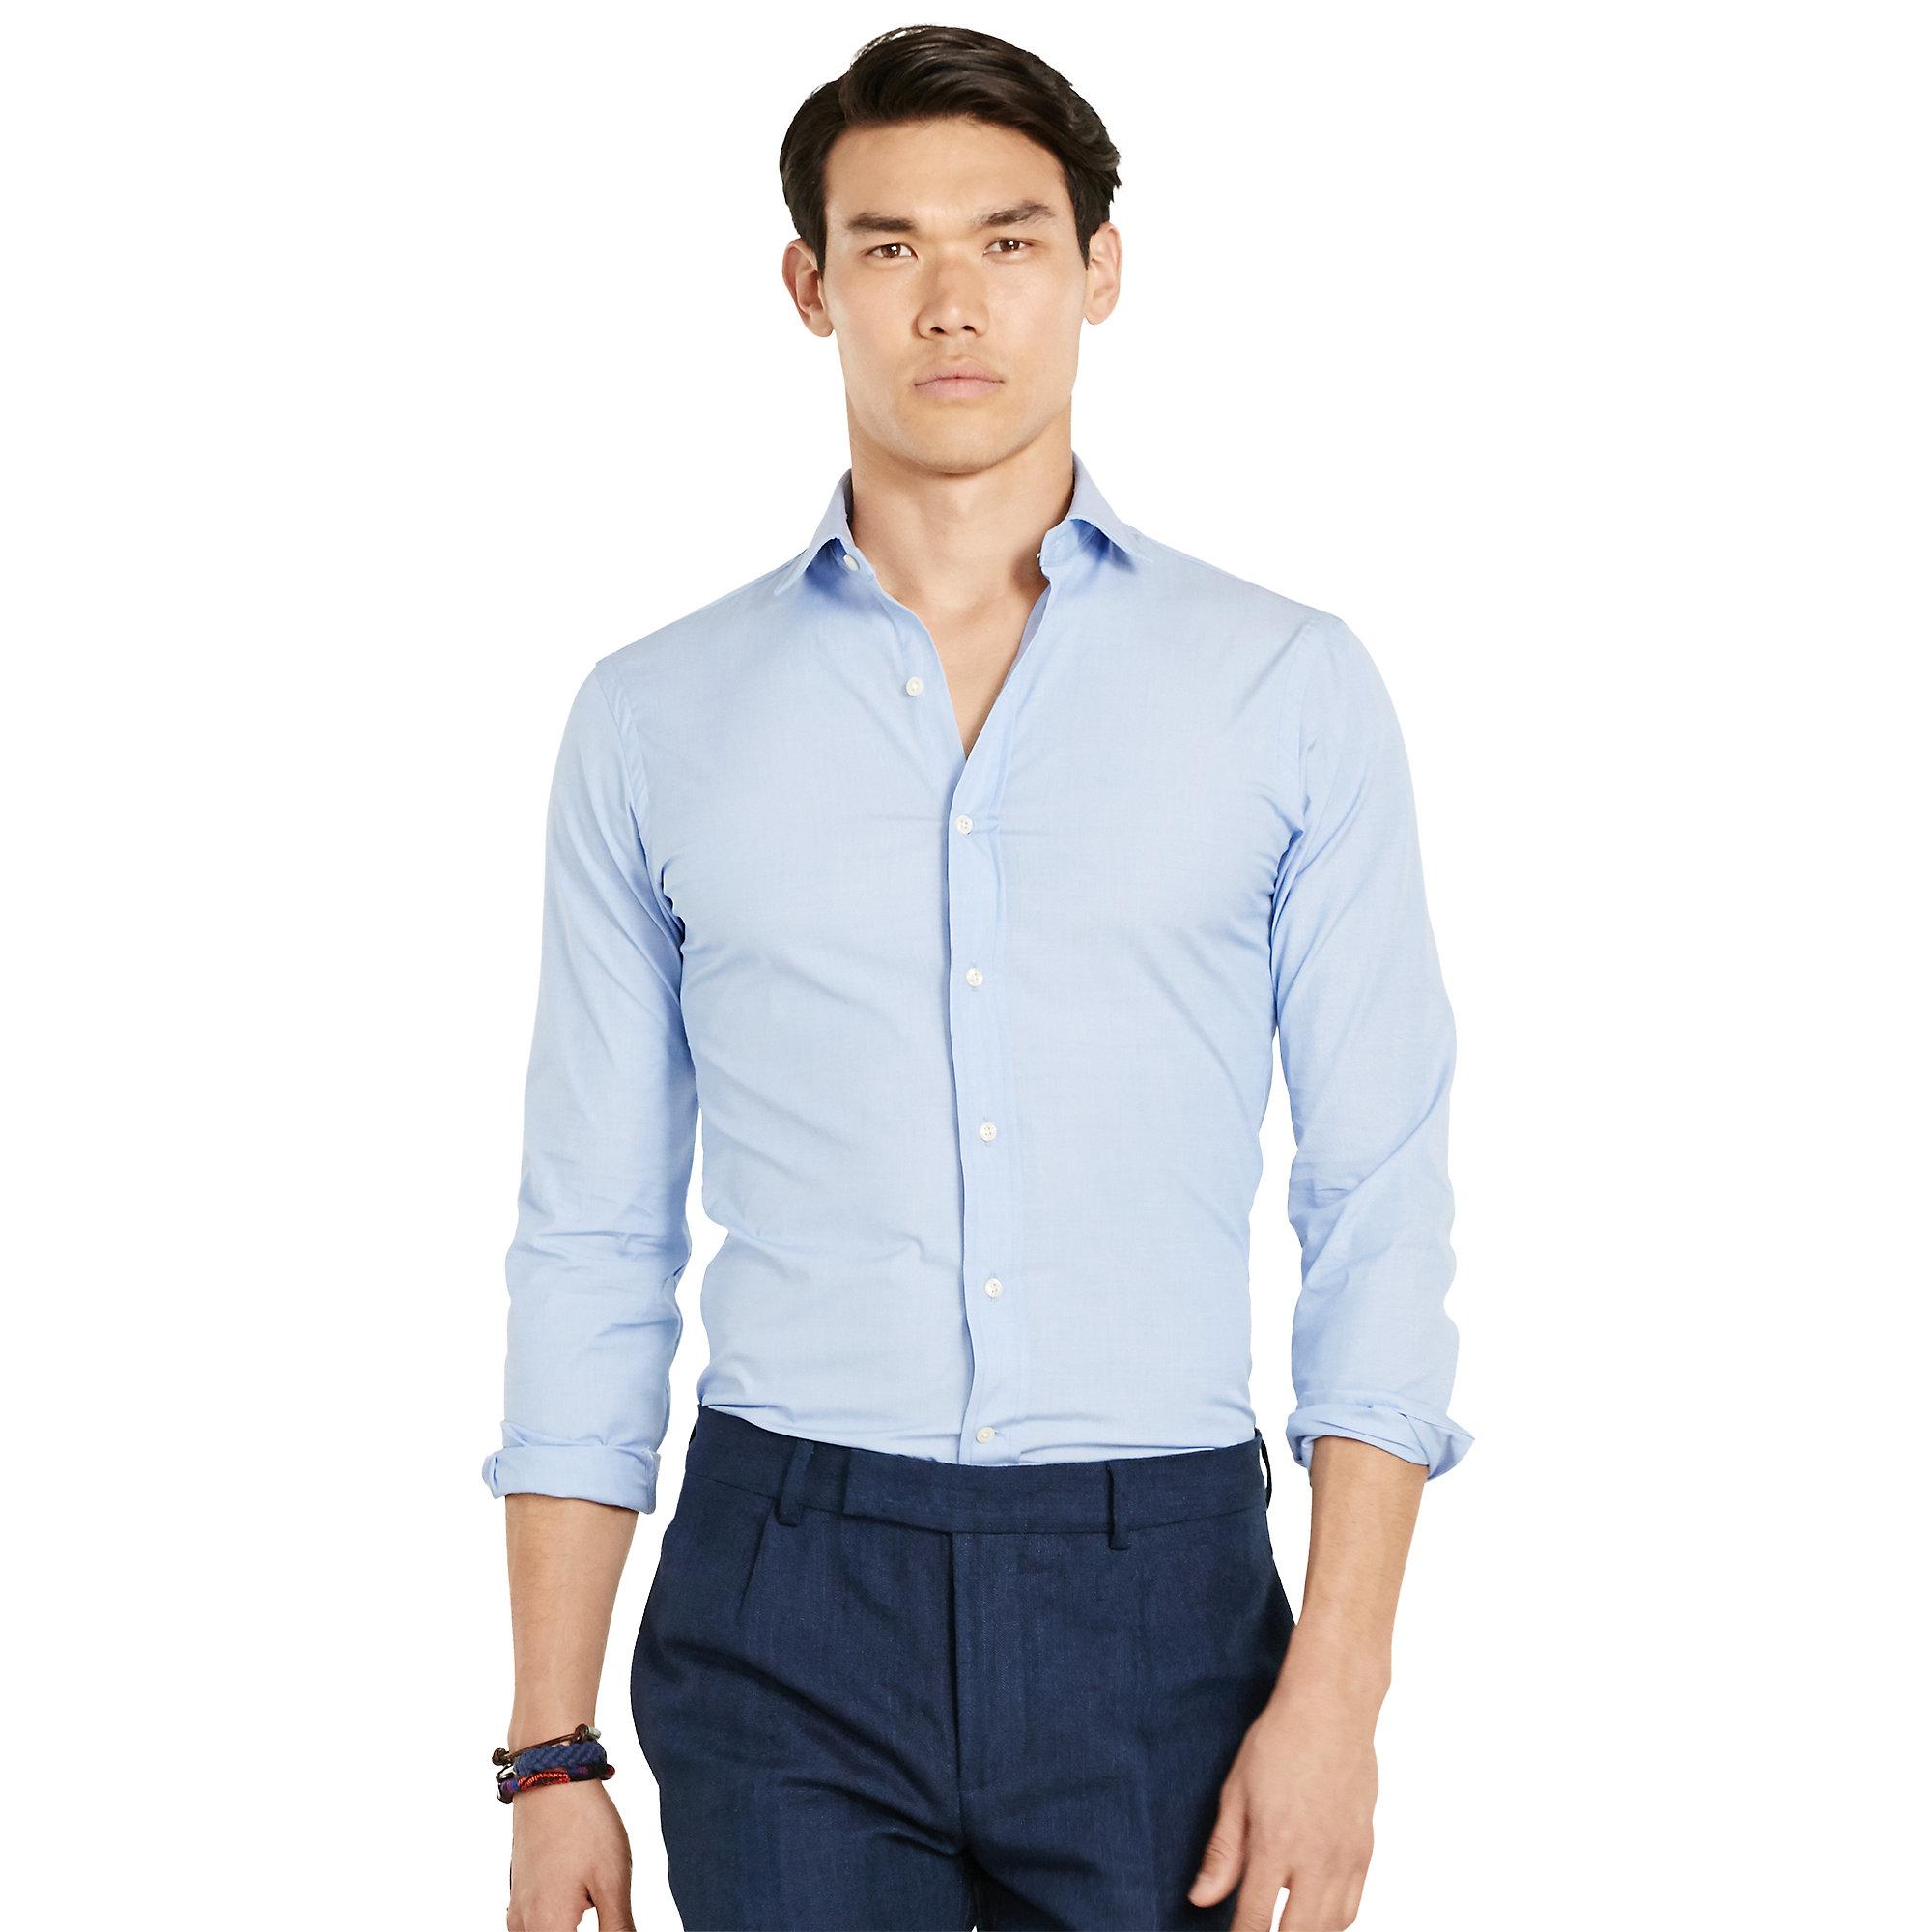 108c34830f0d7 ... striped 52295 63712  ireland lyst polo ralph lauren estate slim fit  stretch shirt in blue for men 9f7d7 10407